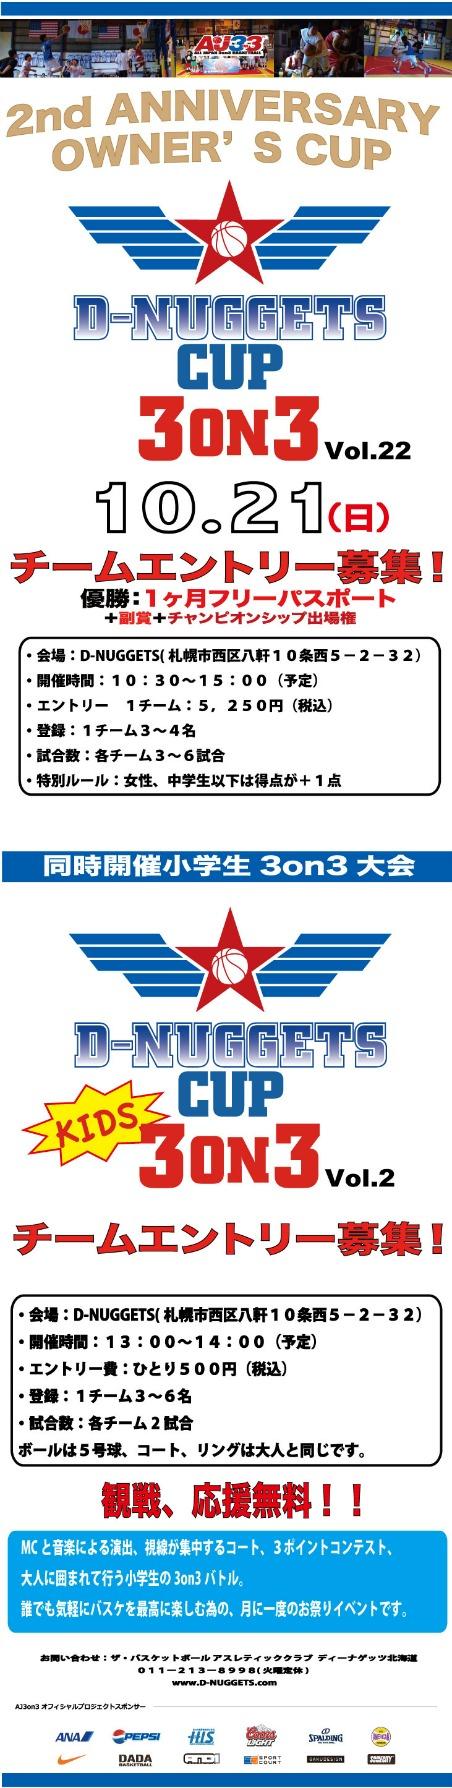 D-NUGGETS-CUP-HOKKAIDO-Vl.22.jpg